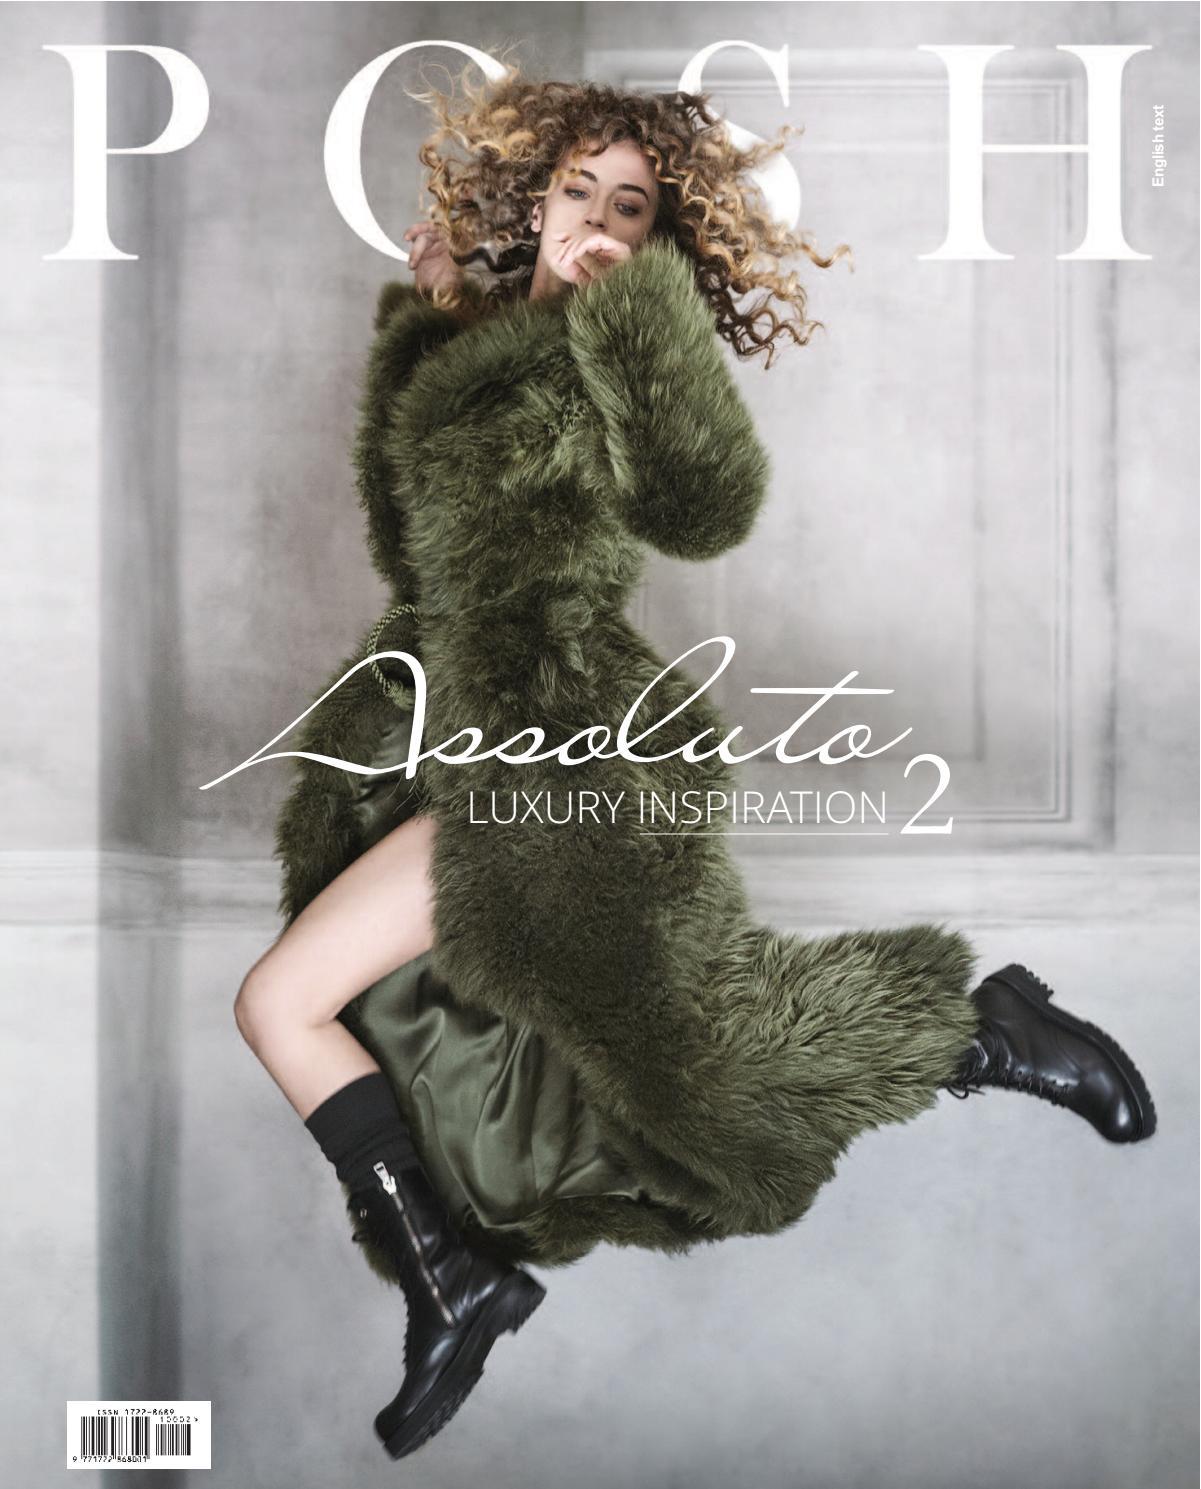 Posh 69 by Unique Media - issuu 440304dfdb1